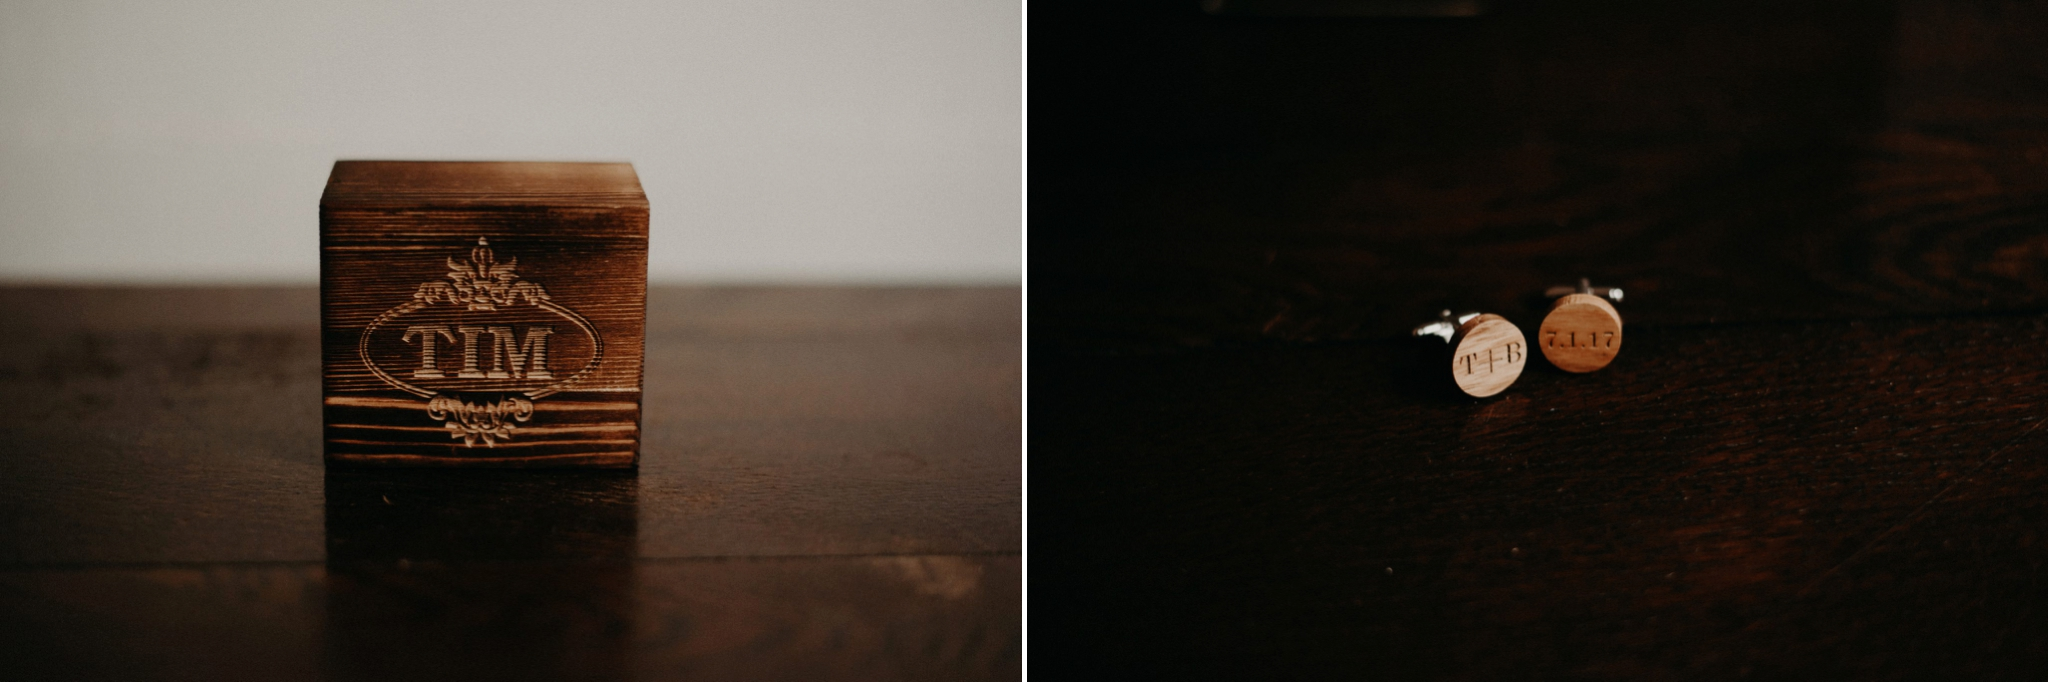 Kerlyn-Van-Gelder-Photography-Corpus-Christi-Photographer_0140.jpg